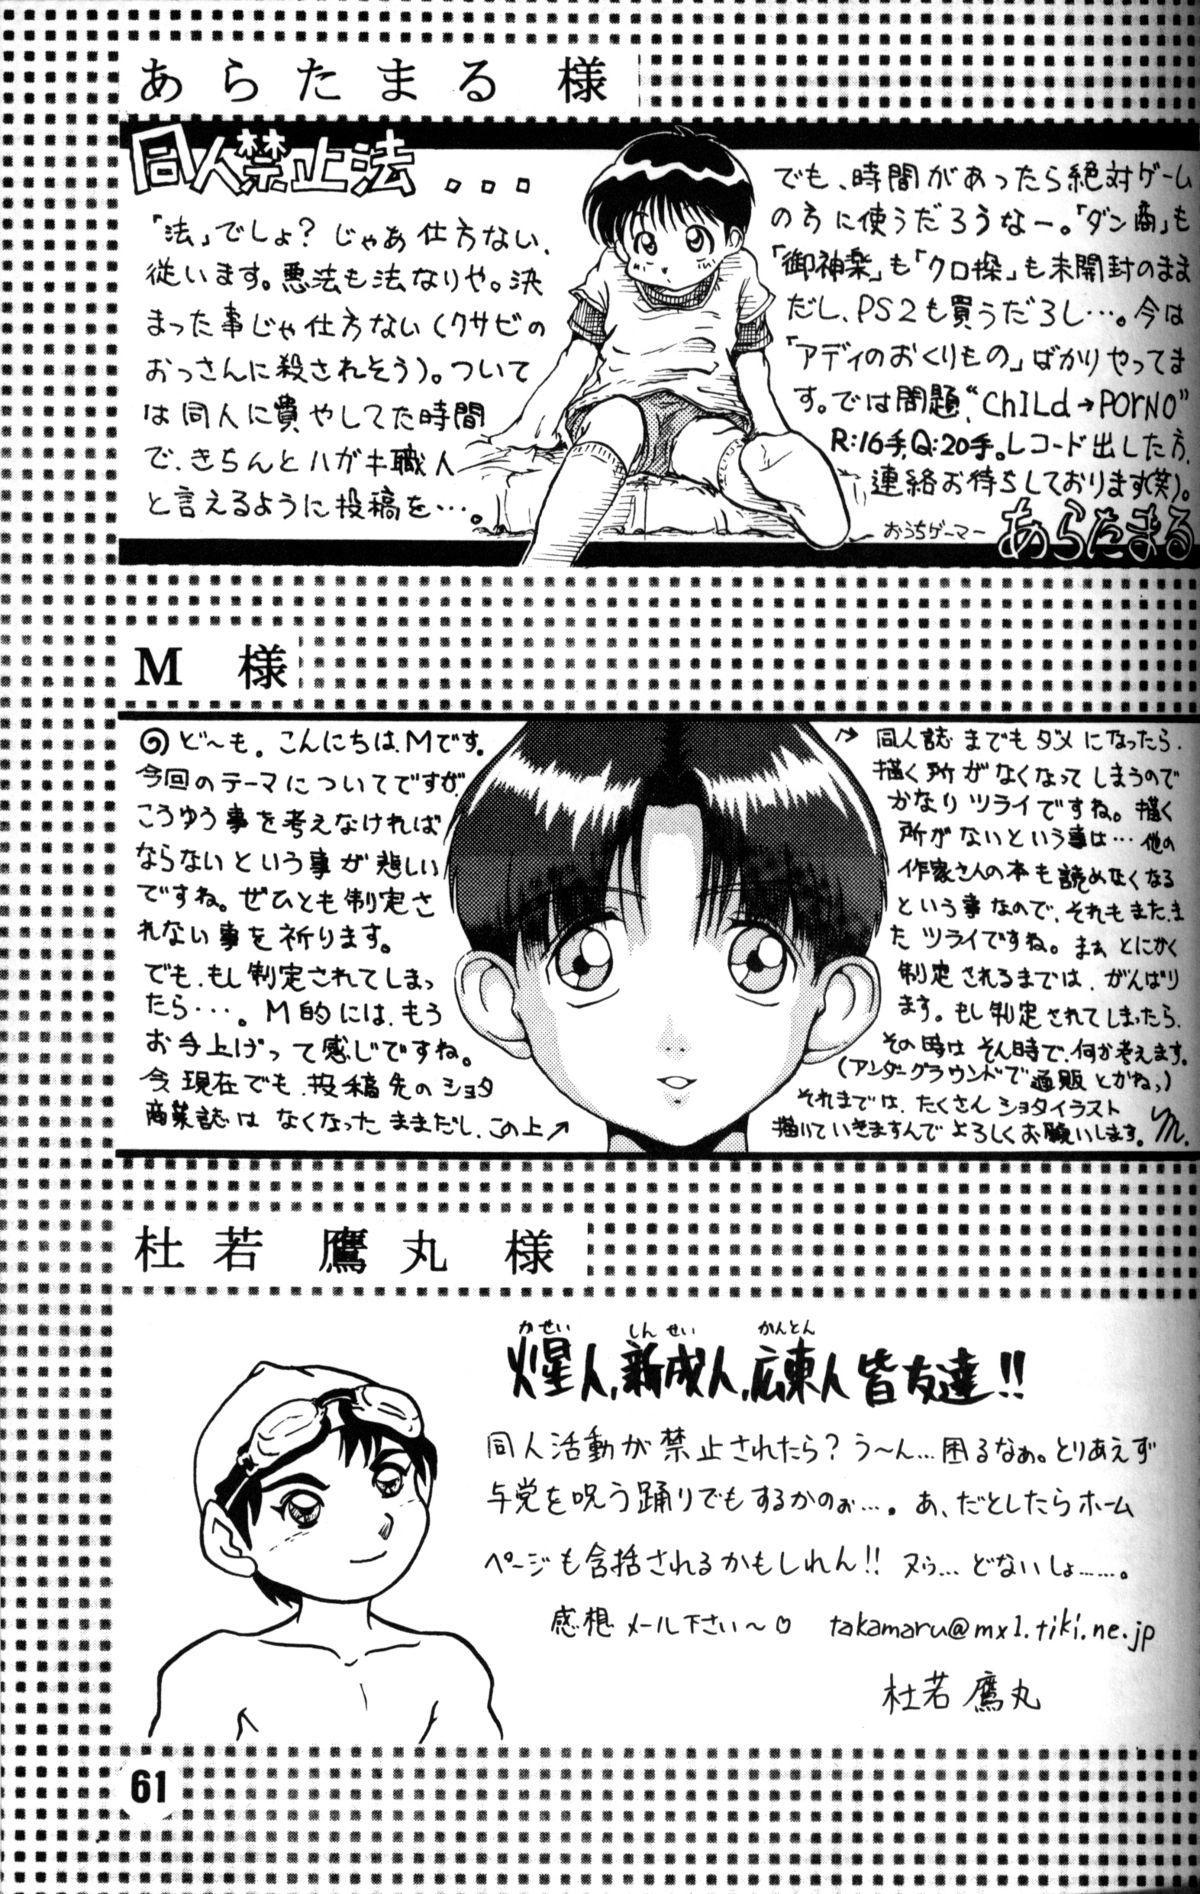 Anthology - Nekketsu Project - Volume 4 'Shounen Vanilla Essence' 59